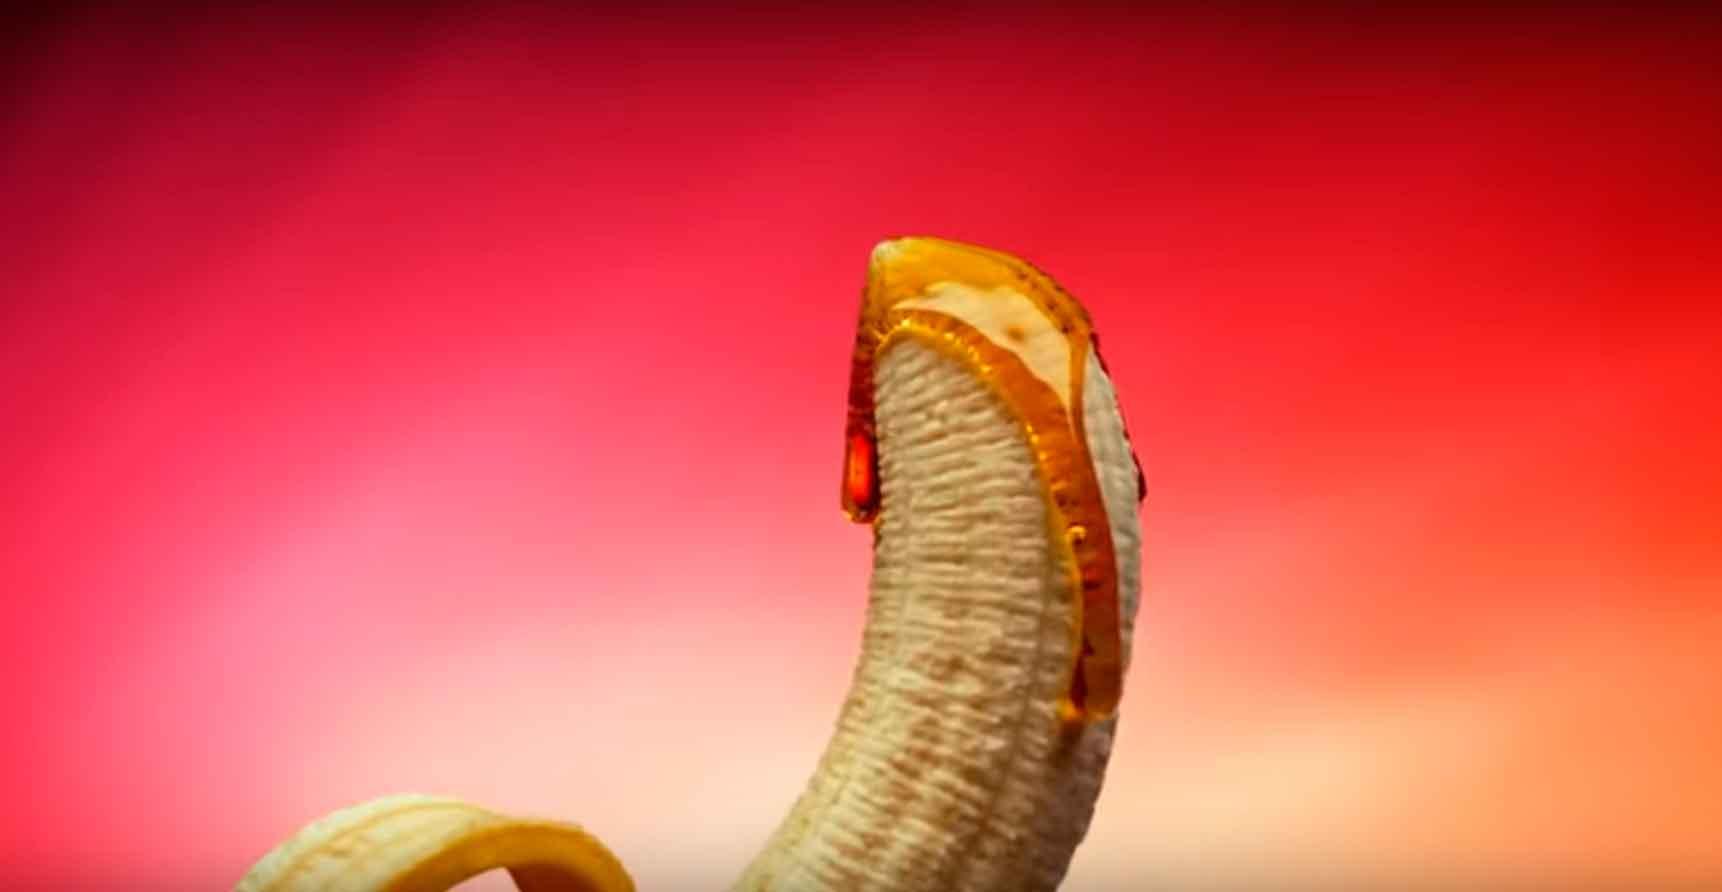 реклама секс шопа статья